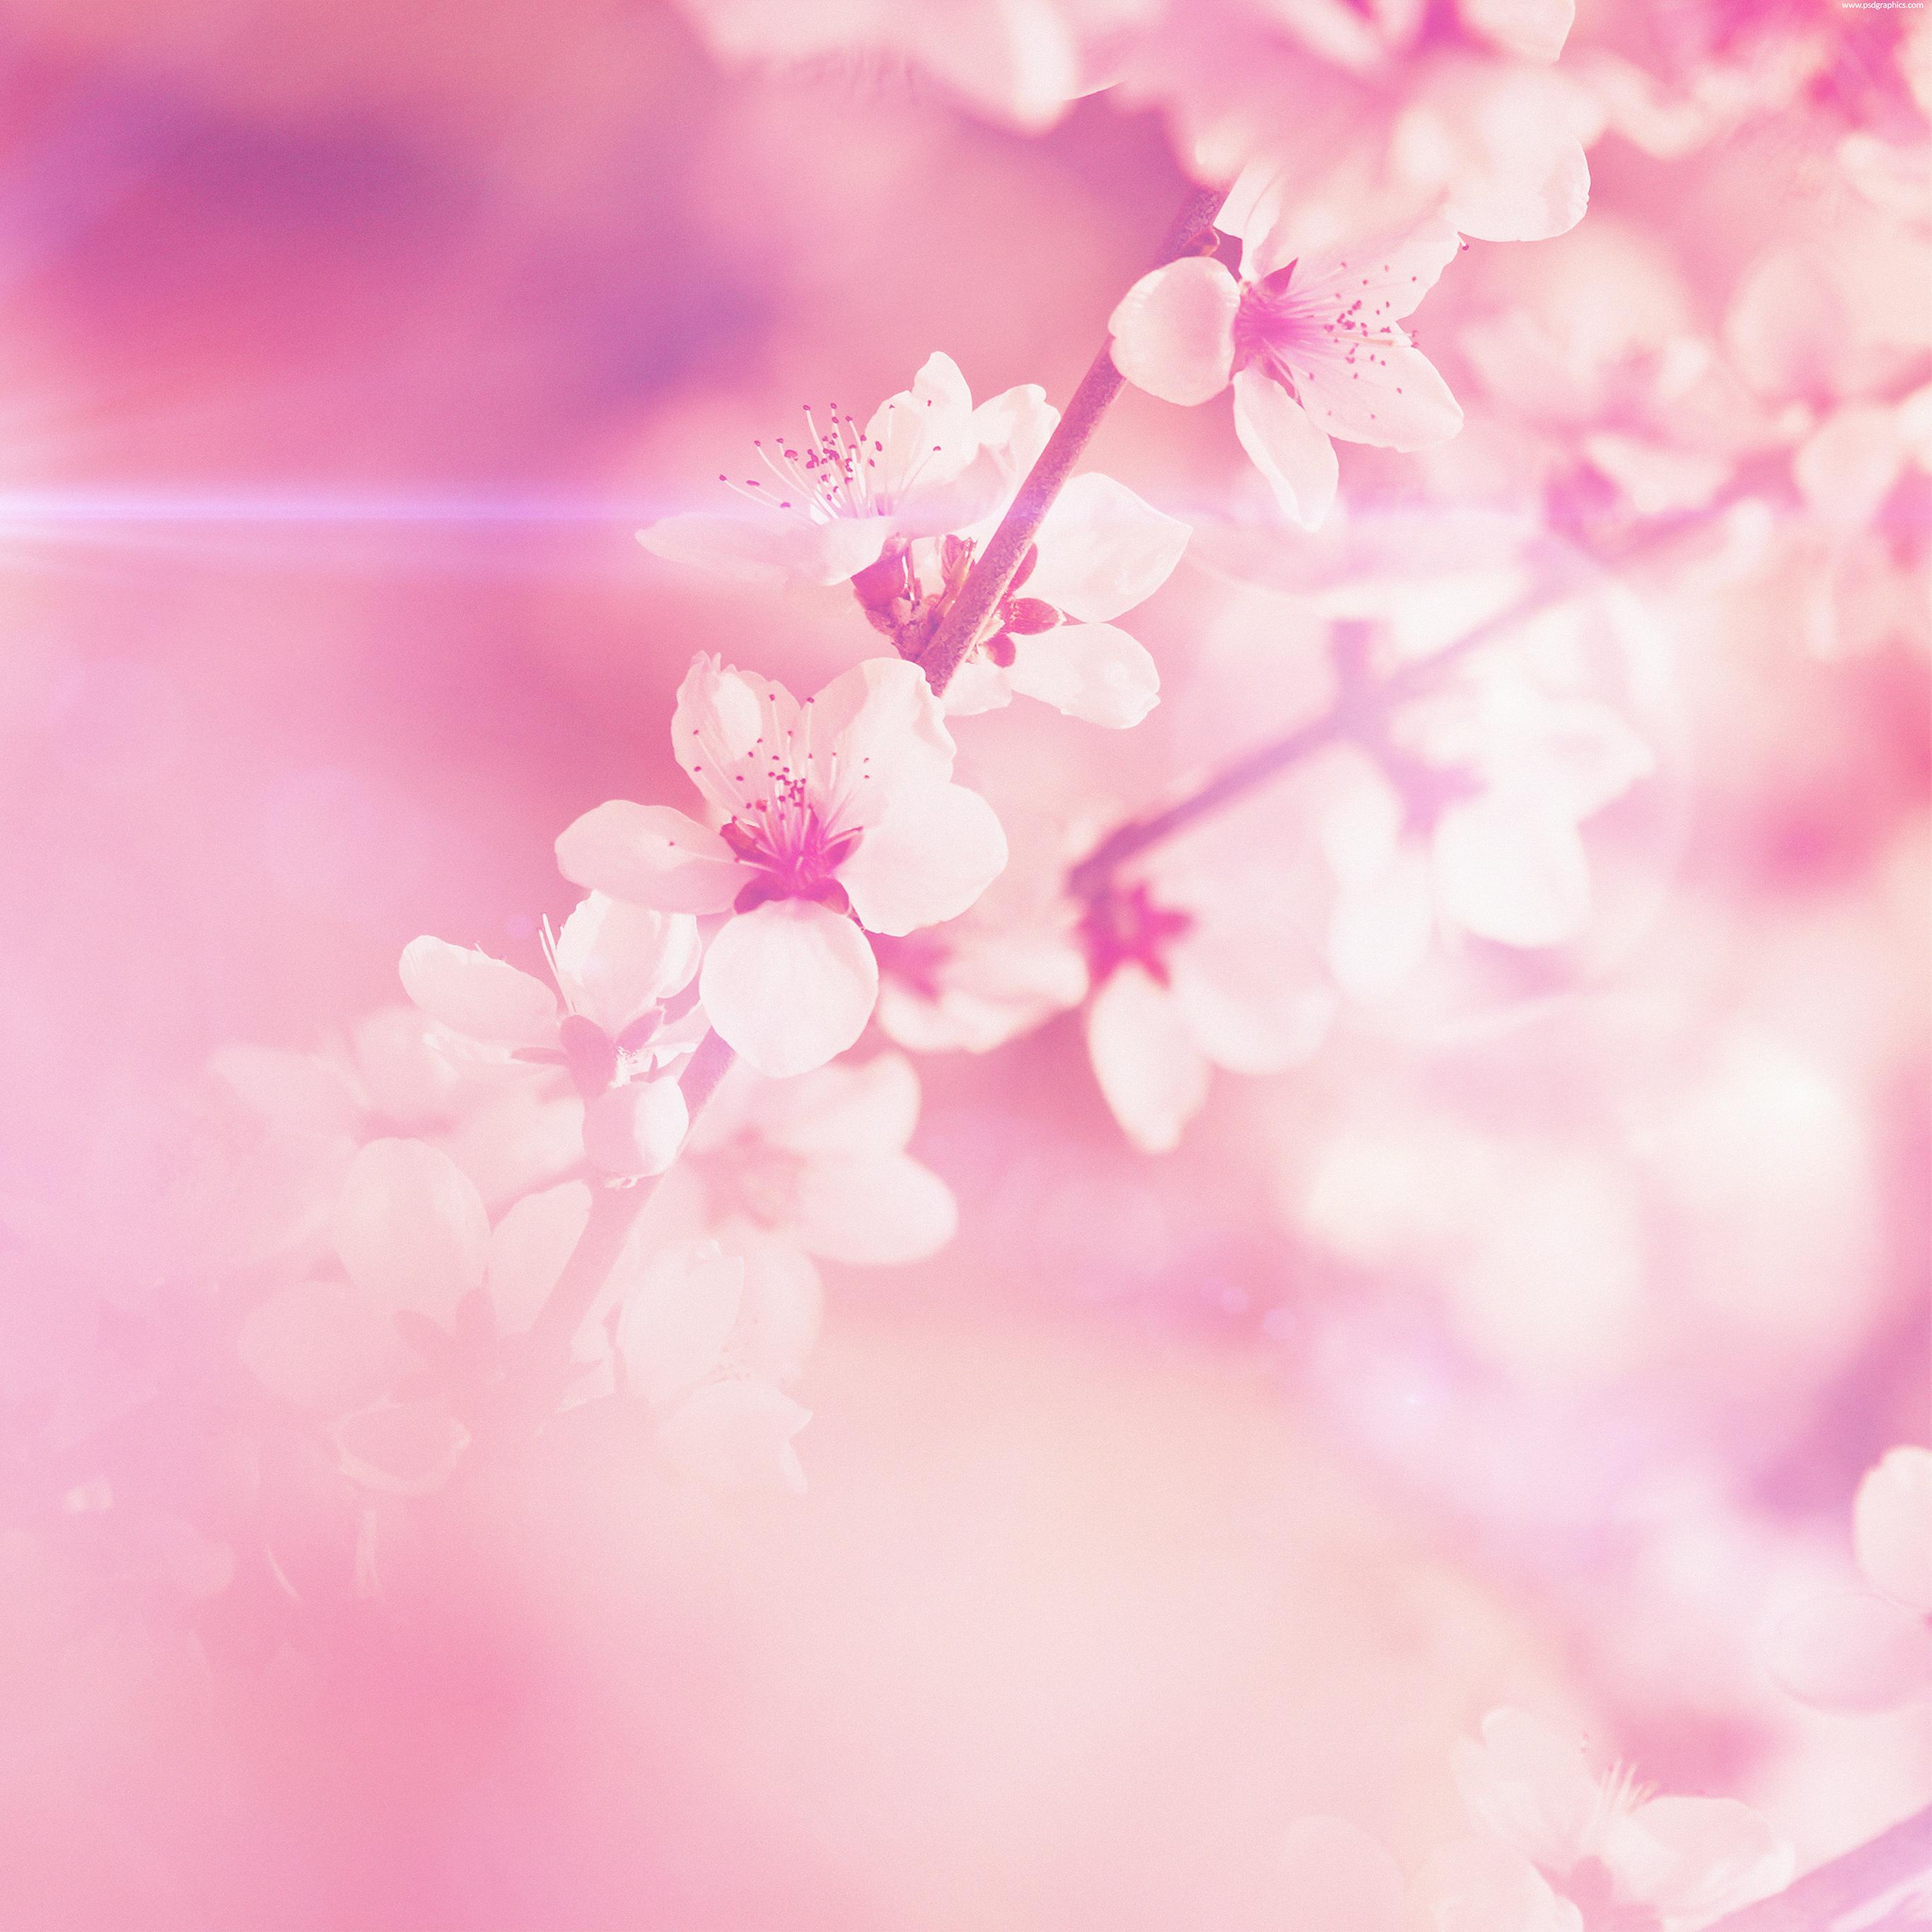 Pink Flowers Wallpaper: Large